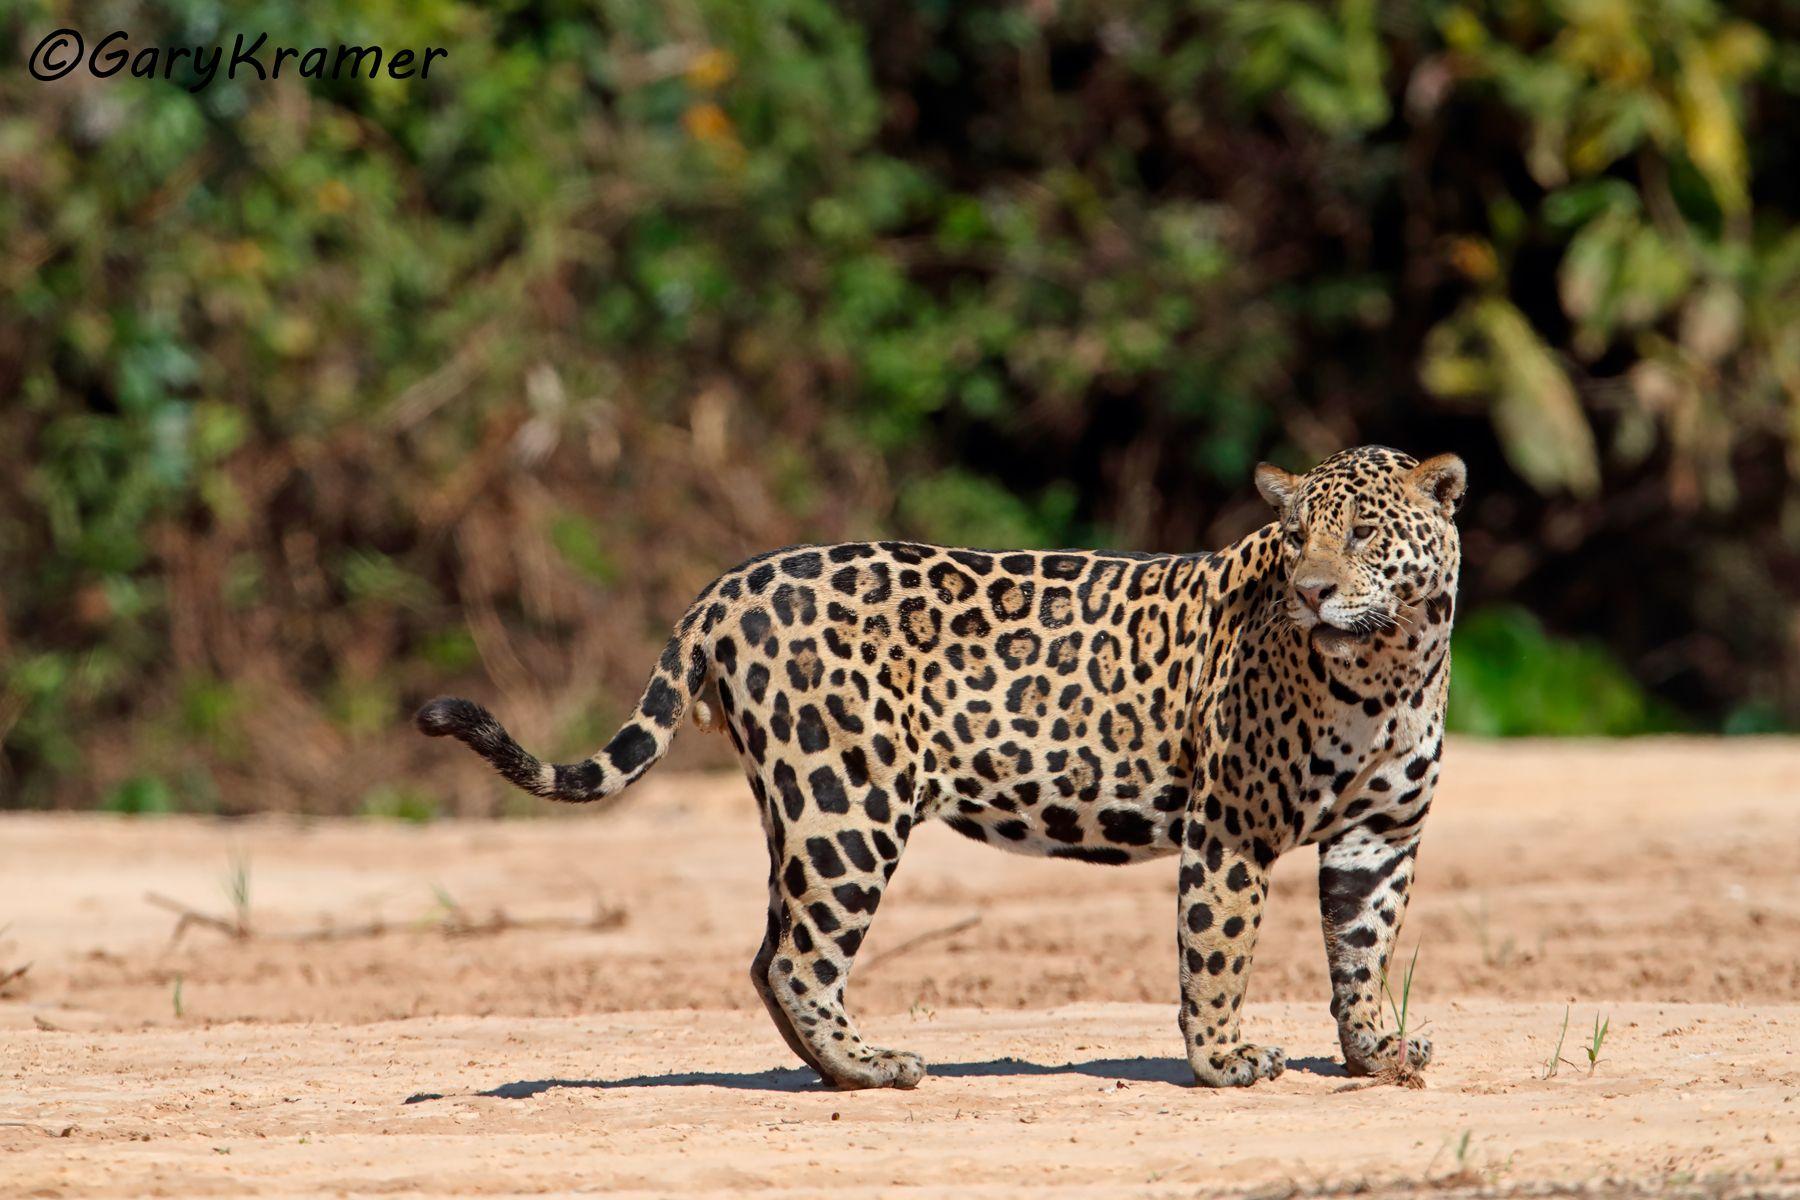 Jaguar (Puma onca) - SMJp#437d